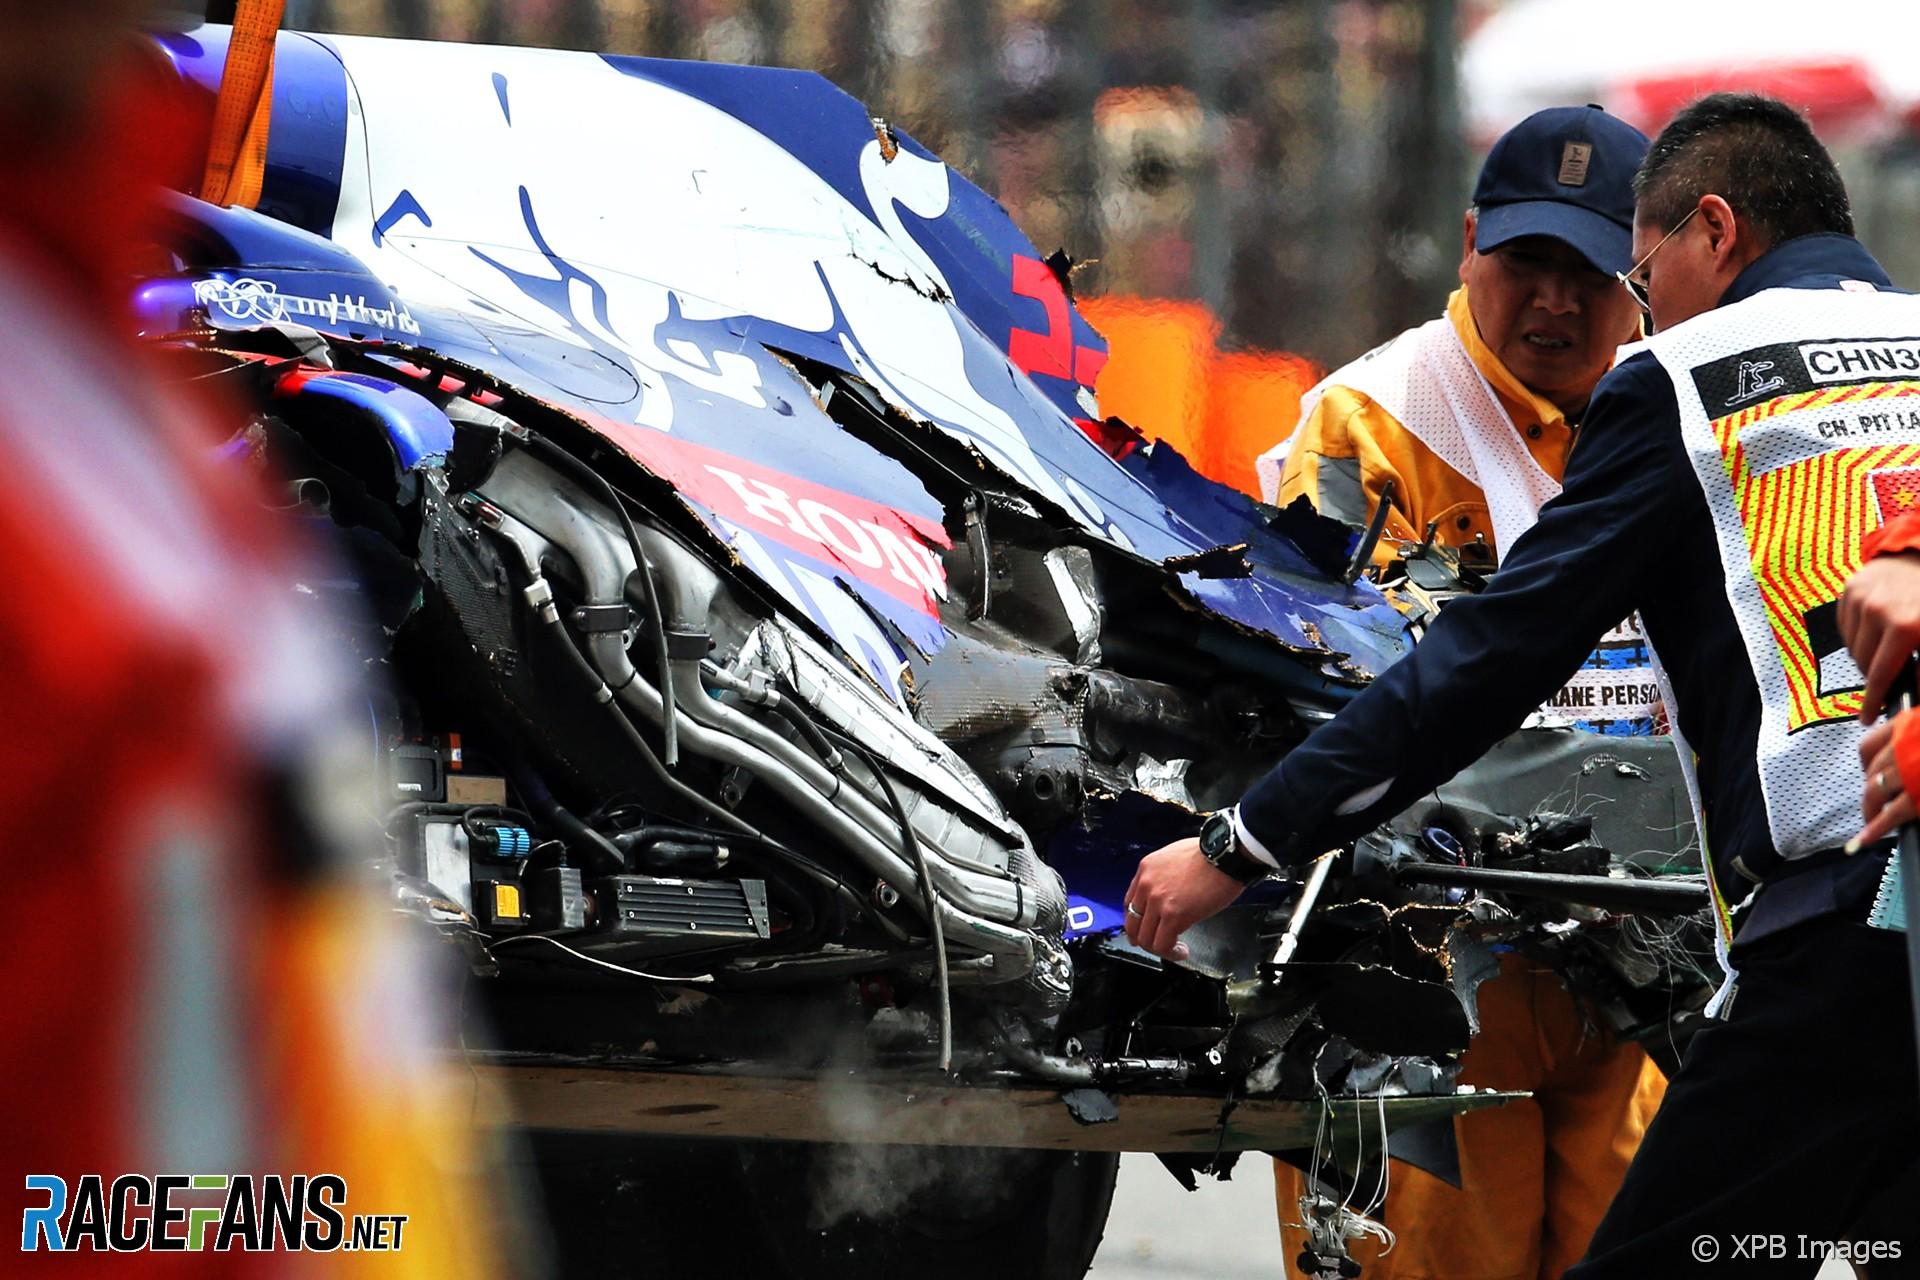 Alexander Albon, Toro Rosso, Shanghai International Circuit, 2019